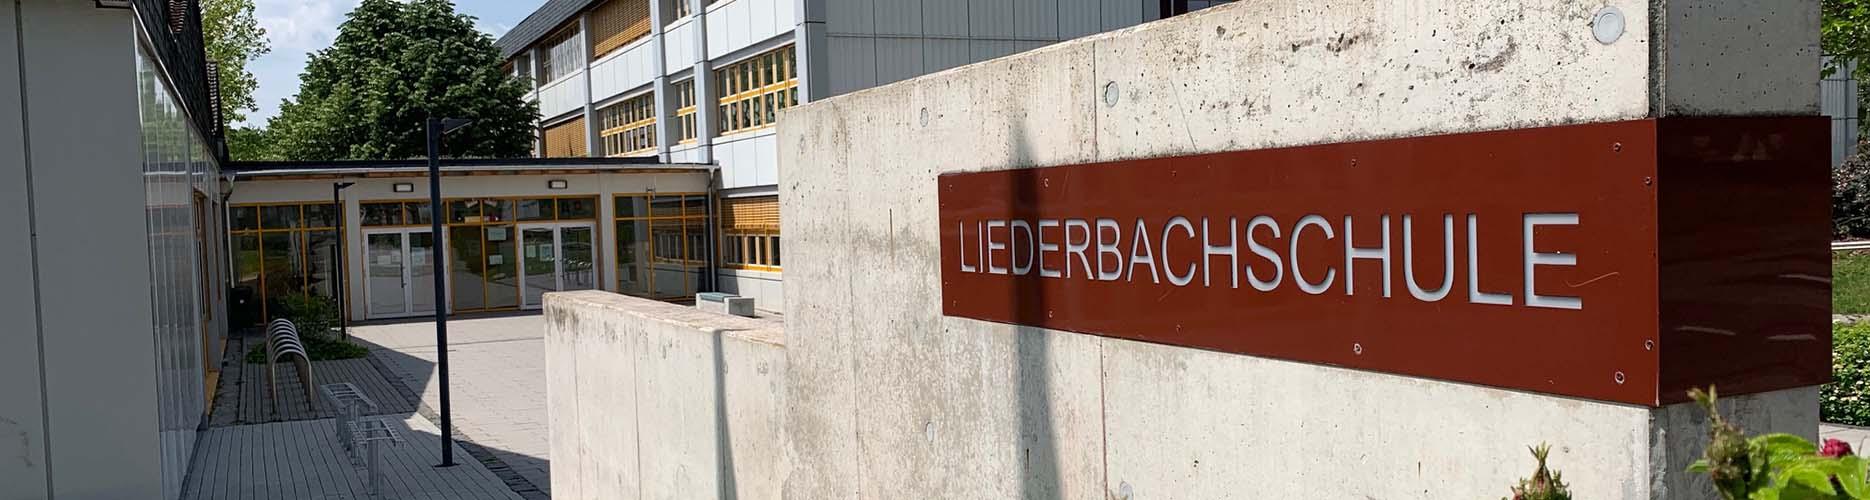 Liederbachschule